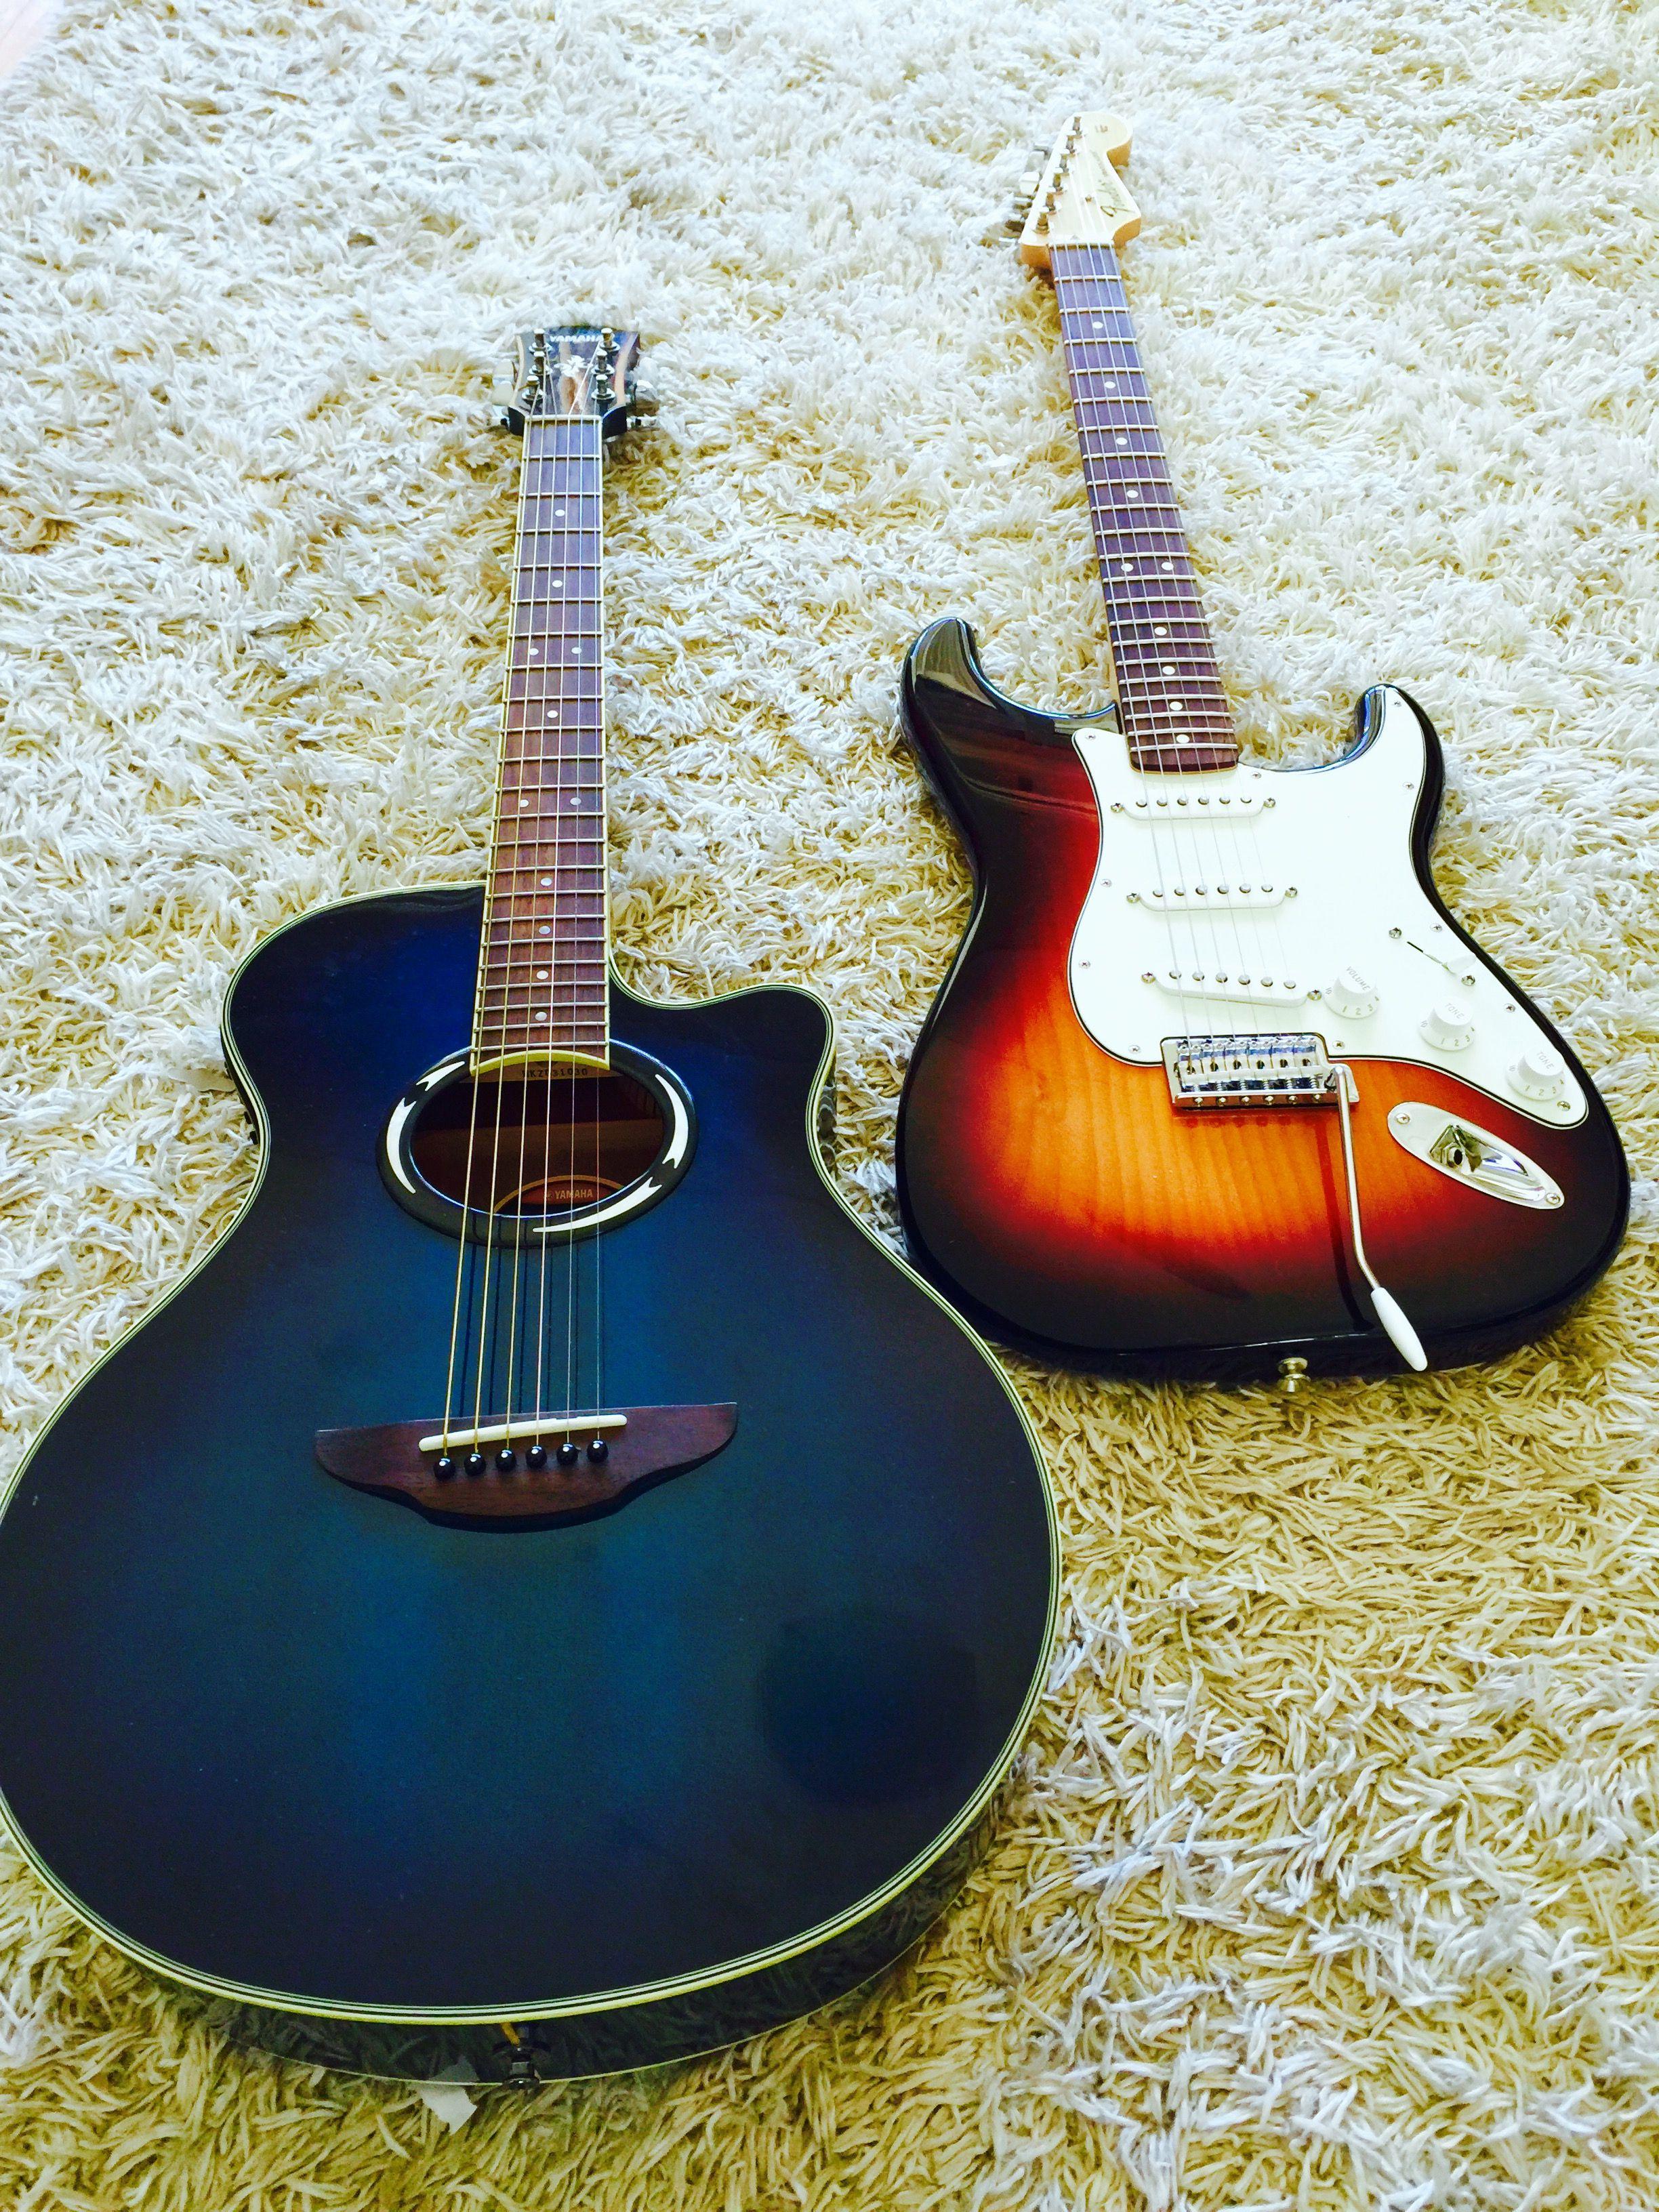 Fender Standard Stratacaster Yamaha Apx500 Acoustic Guitar Acoustic Music Instruments